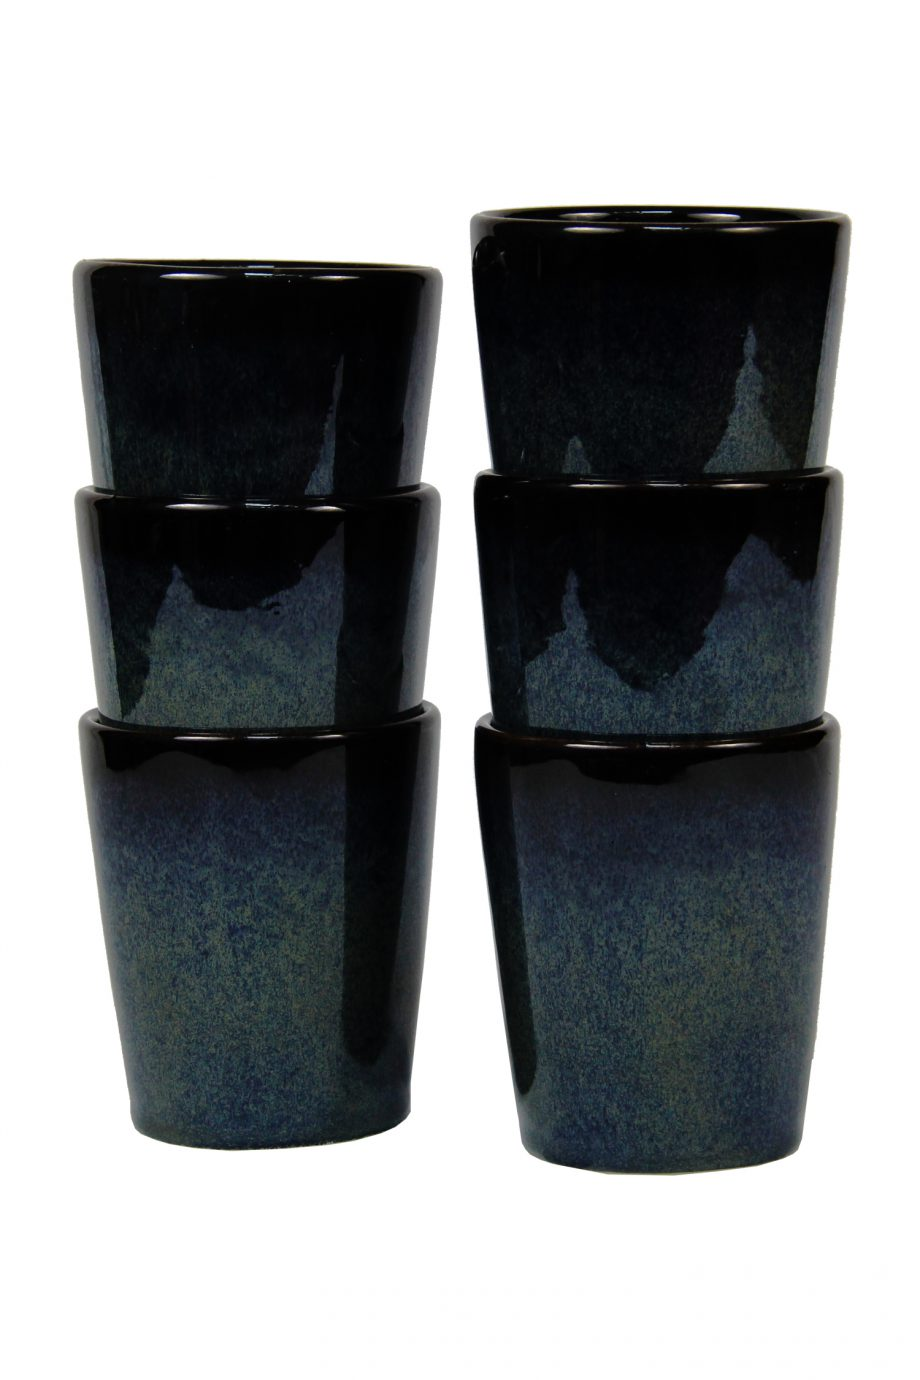 kop-ink-glaze-ceramic-large-3